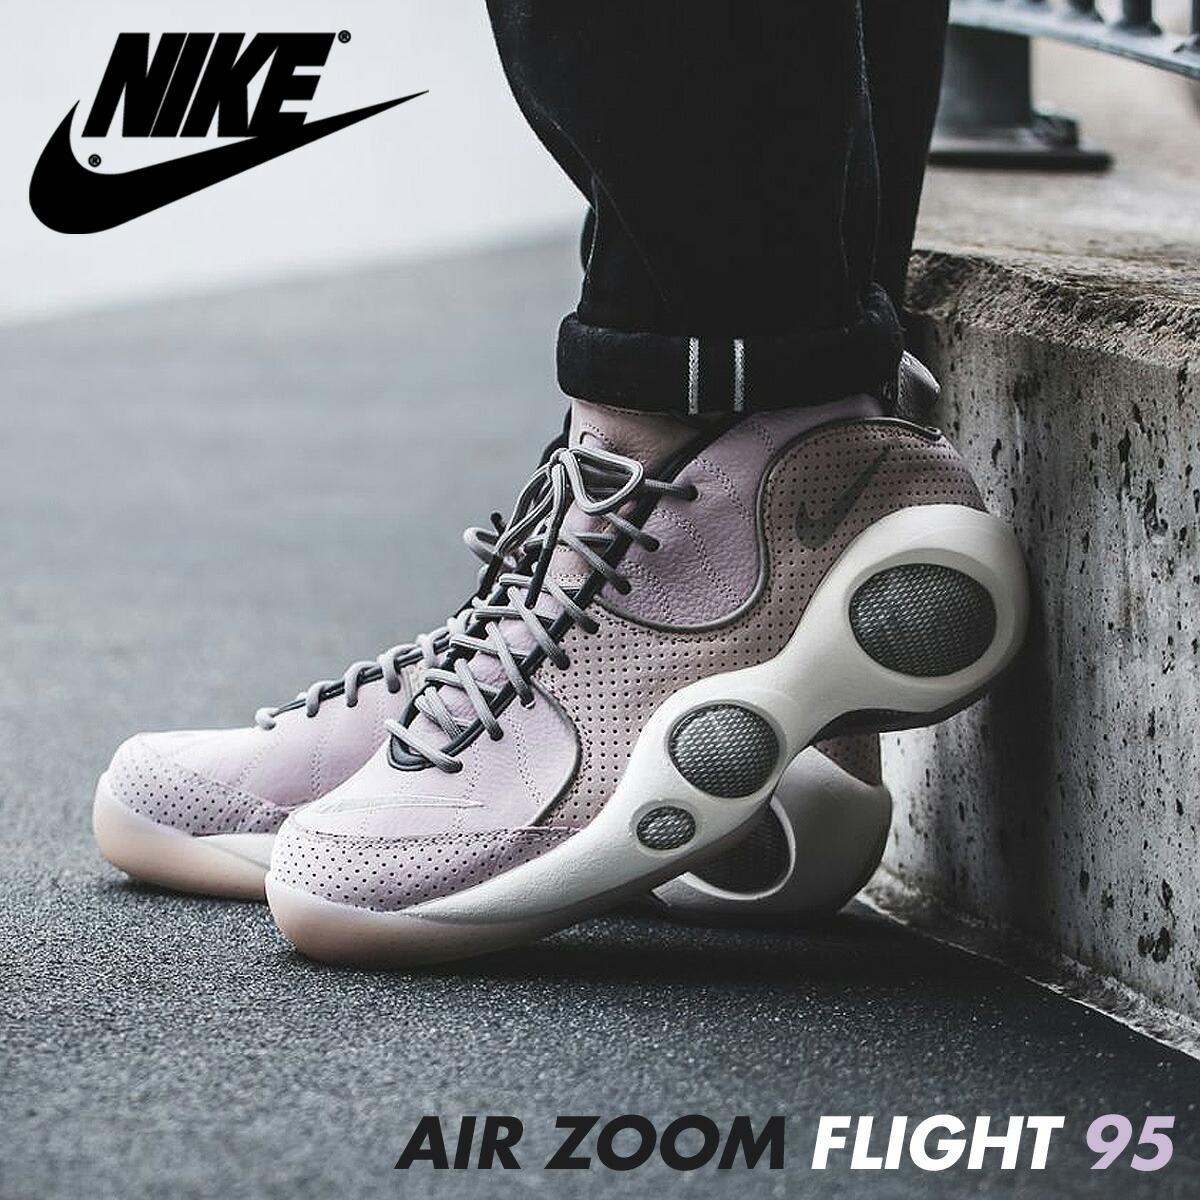 4b898fe4e7a6 Whats up Sports  Nike laboratory NIKE LAB air zoom flight 95 Lady s ...